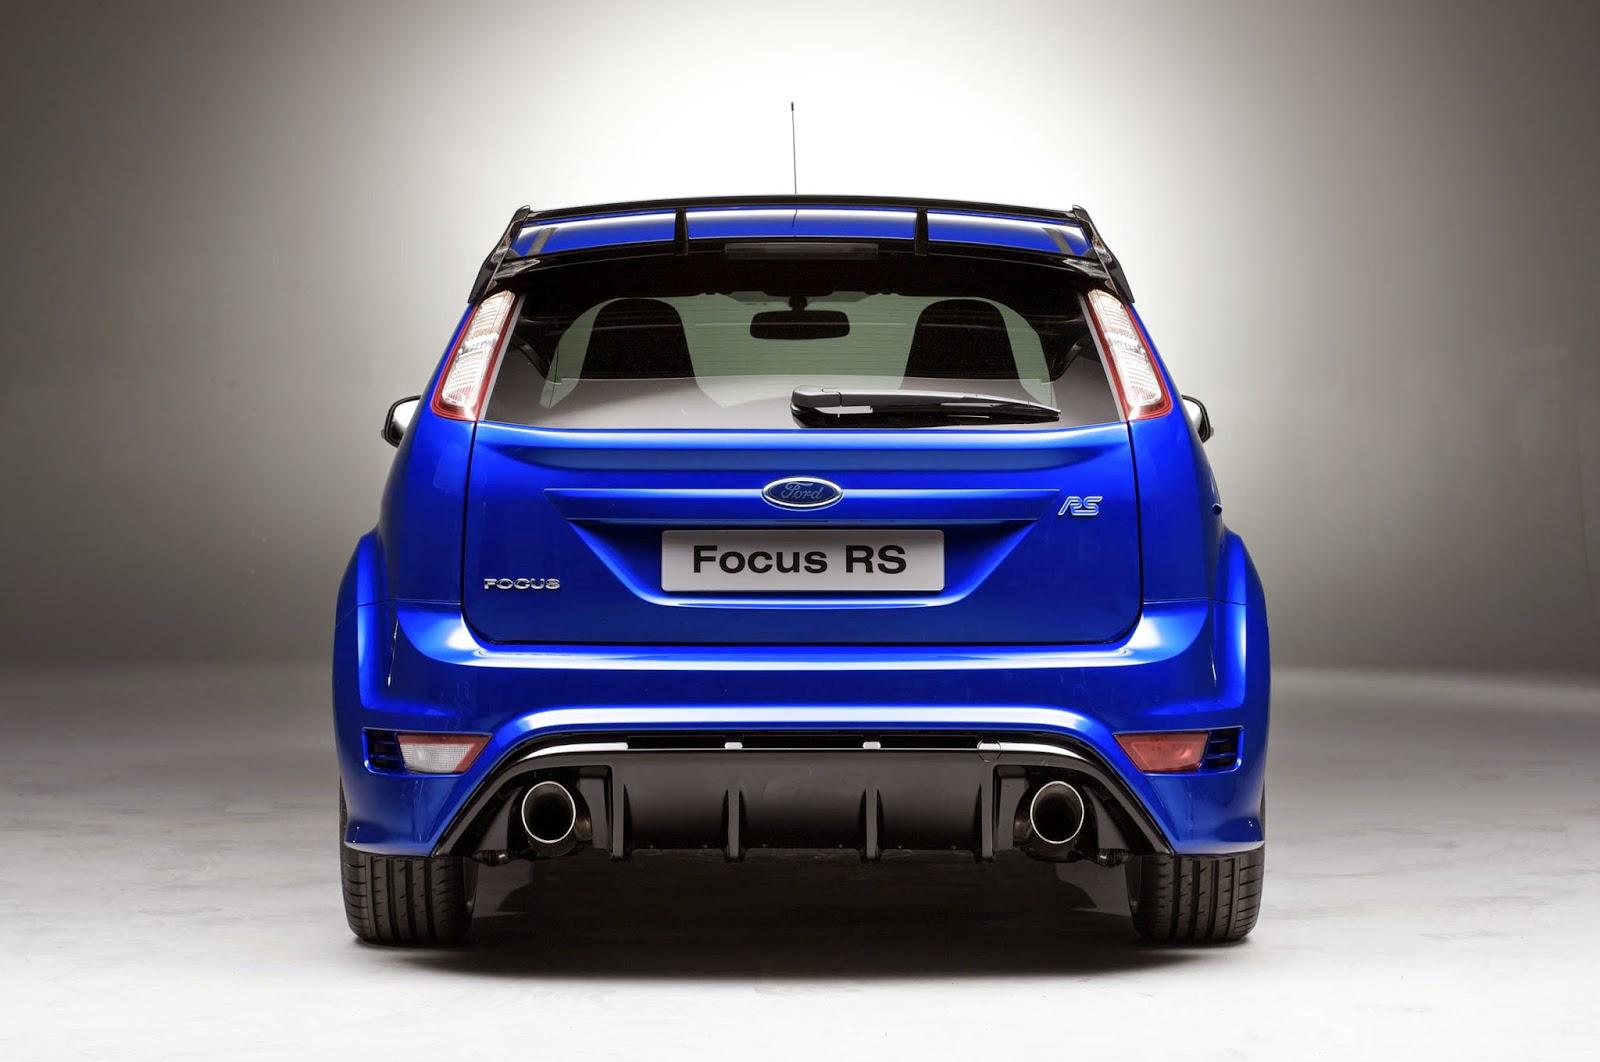 ford focus rs 2016 nice car wallpaper car wallpaper hd. Black Bedroom Furniture Sets. Home Design Ideas